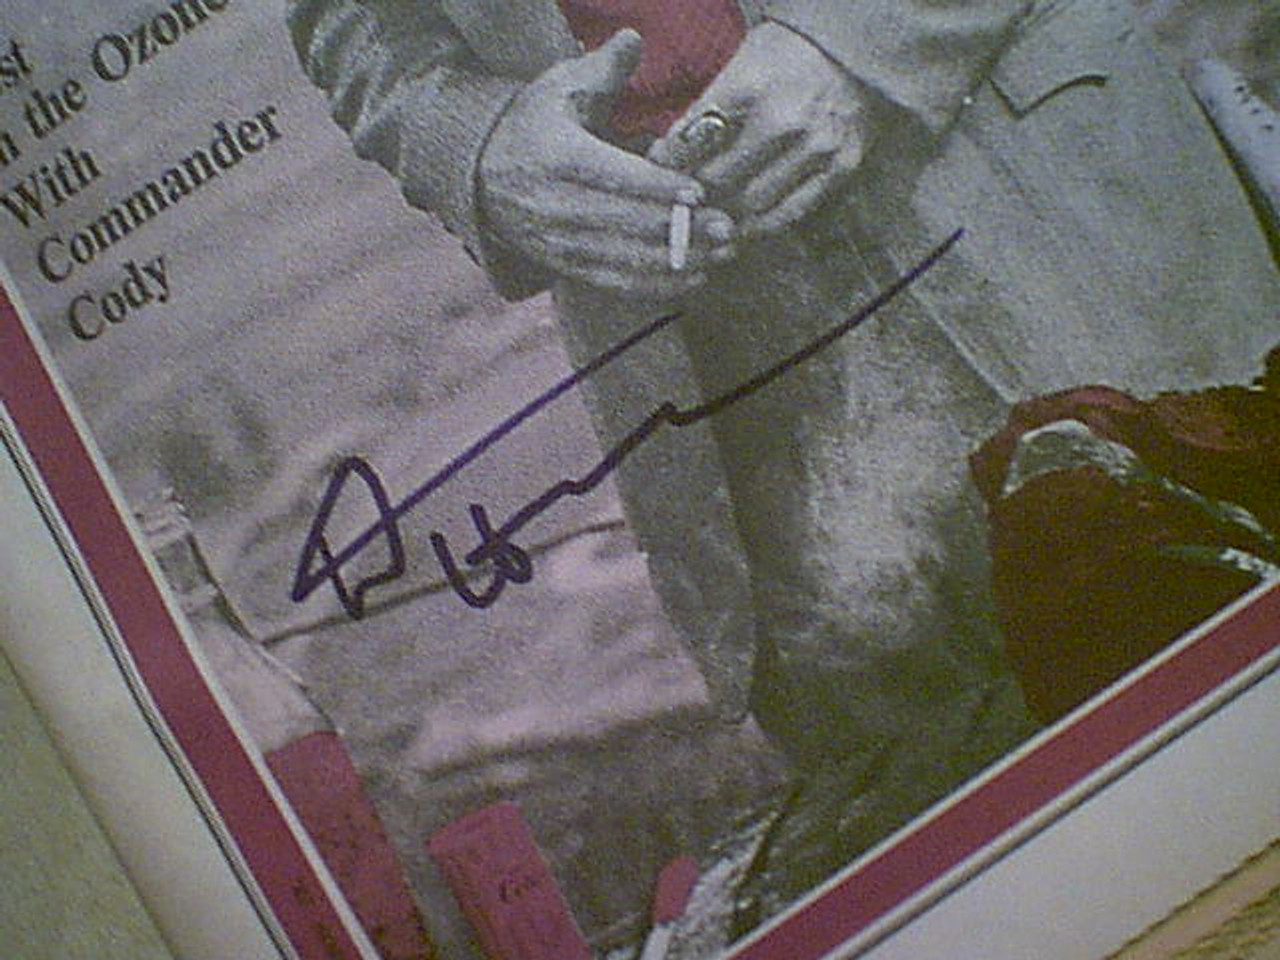 Hopper, Dennis 1970 Rolling Stone Magazine Signed Autograph Cover Photo